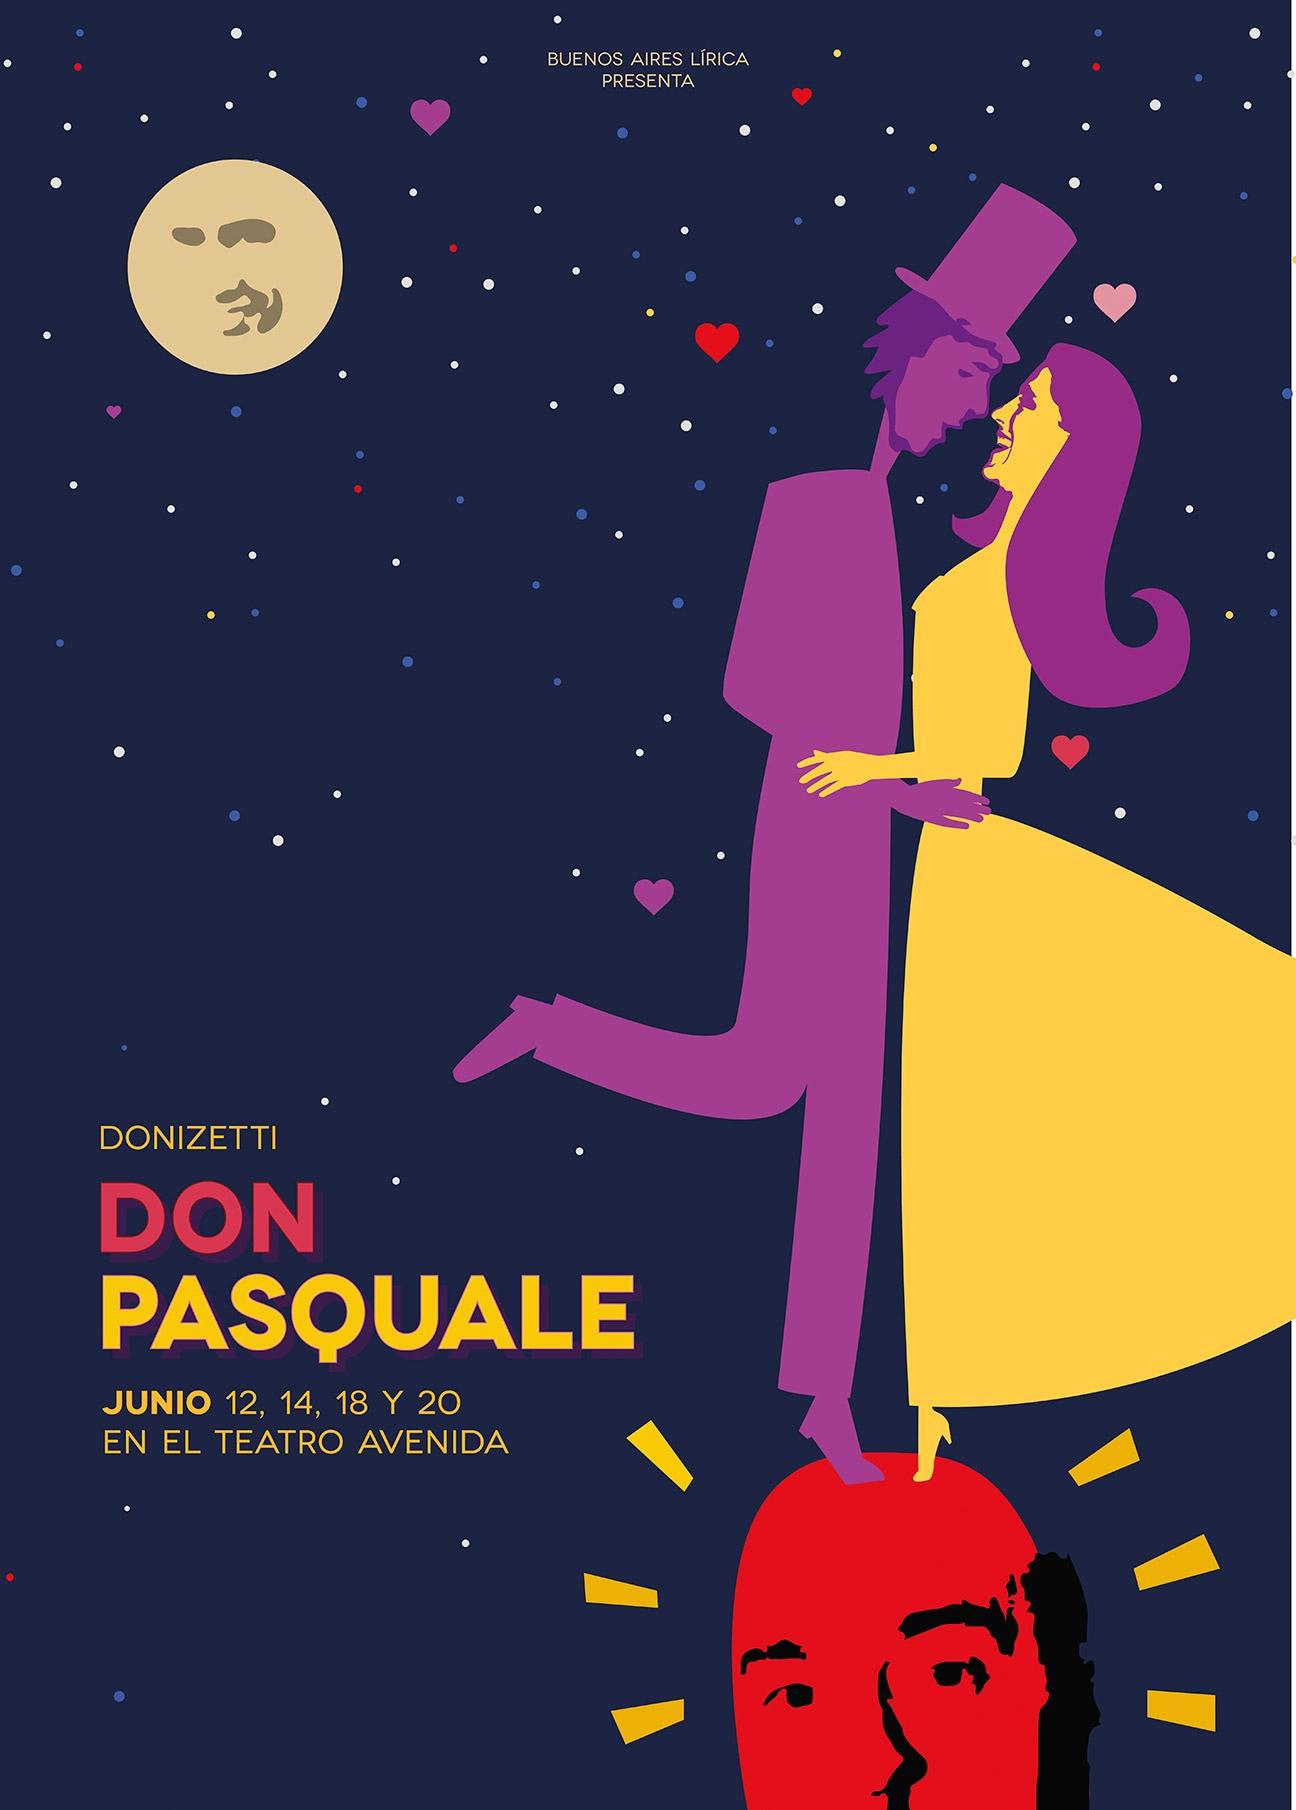 Diseño de afiche para ópera Don Pasquale - poster - BAL - productora de ópera. Diseño para redes sociales. Afiches.